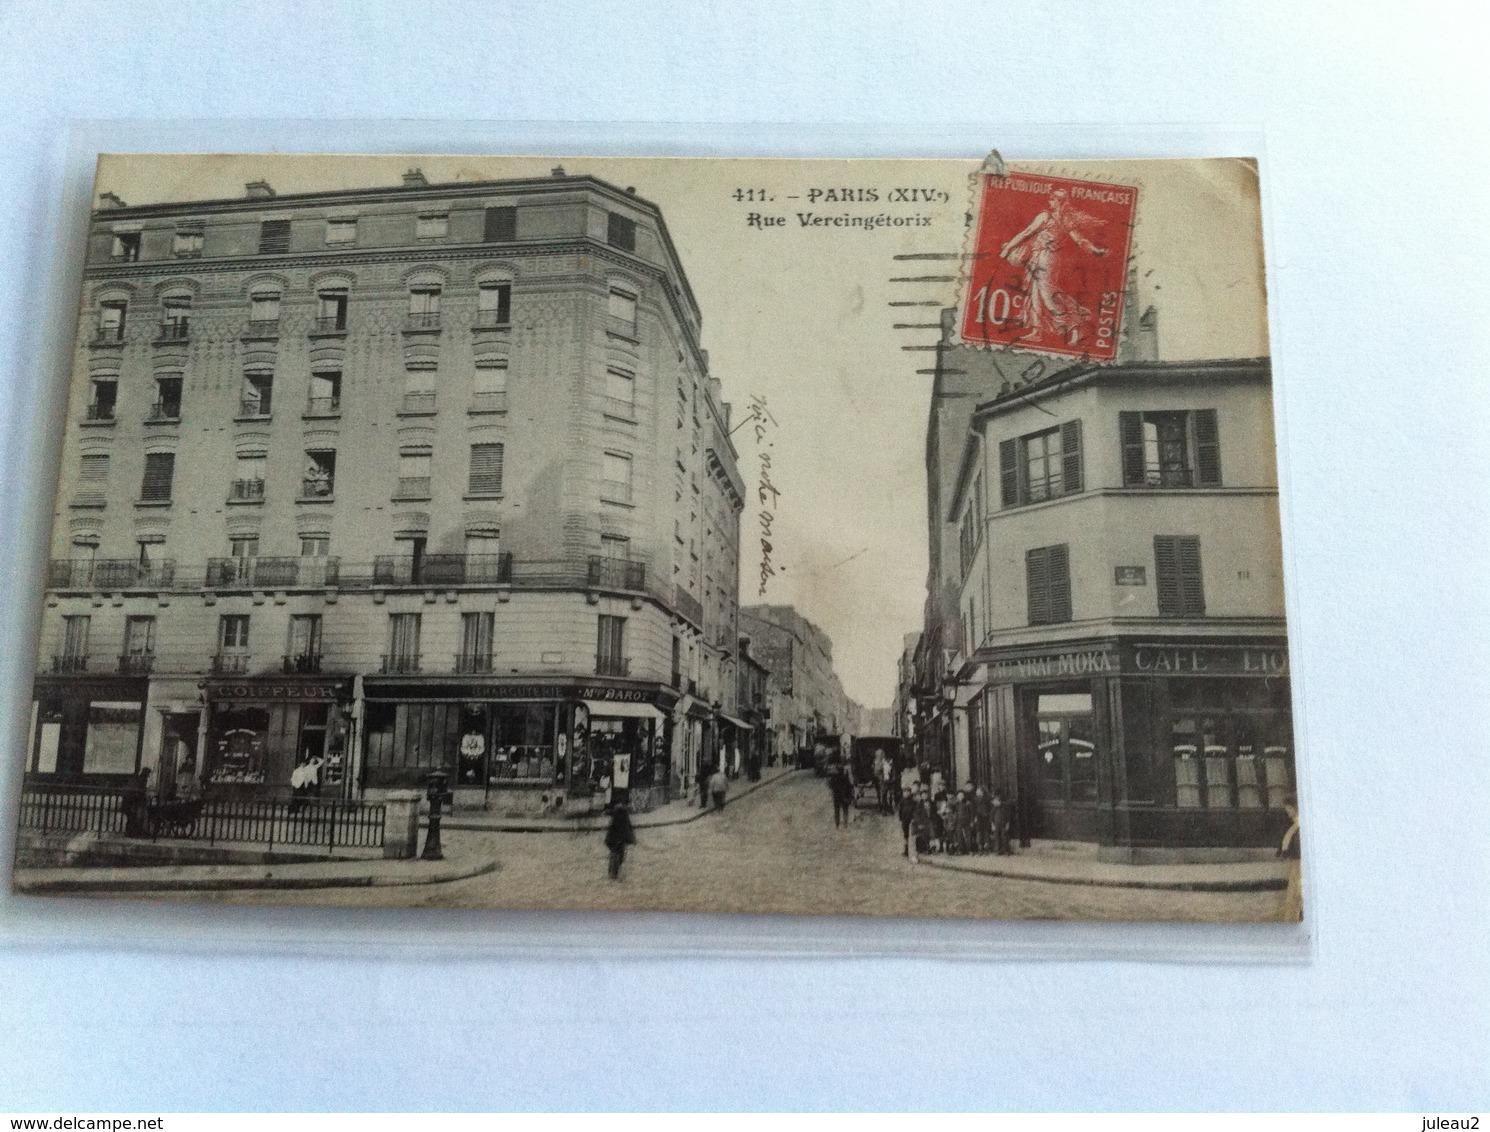 411 - Paris (XIV) Rue Vercingétorix - Arrondissement: 14